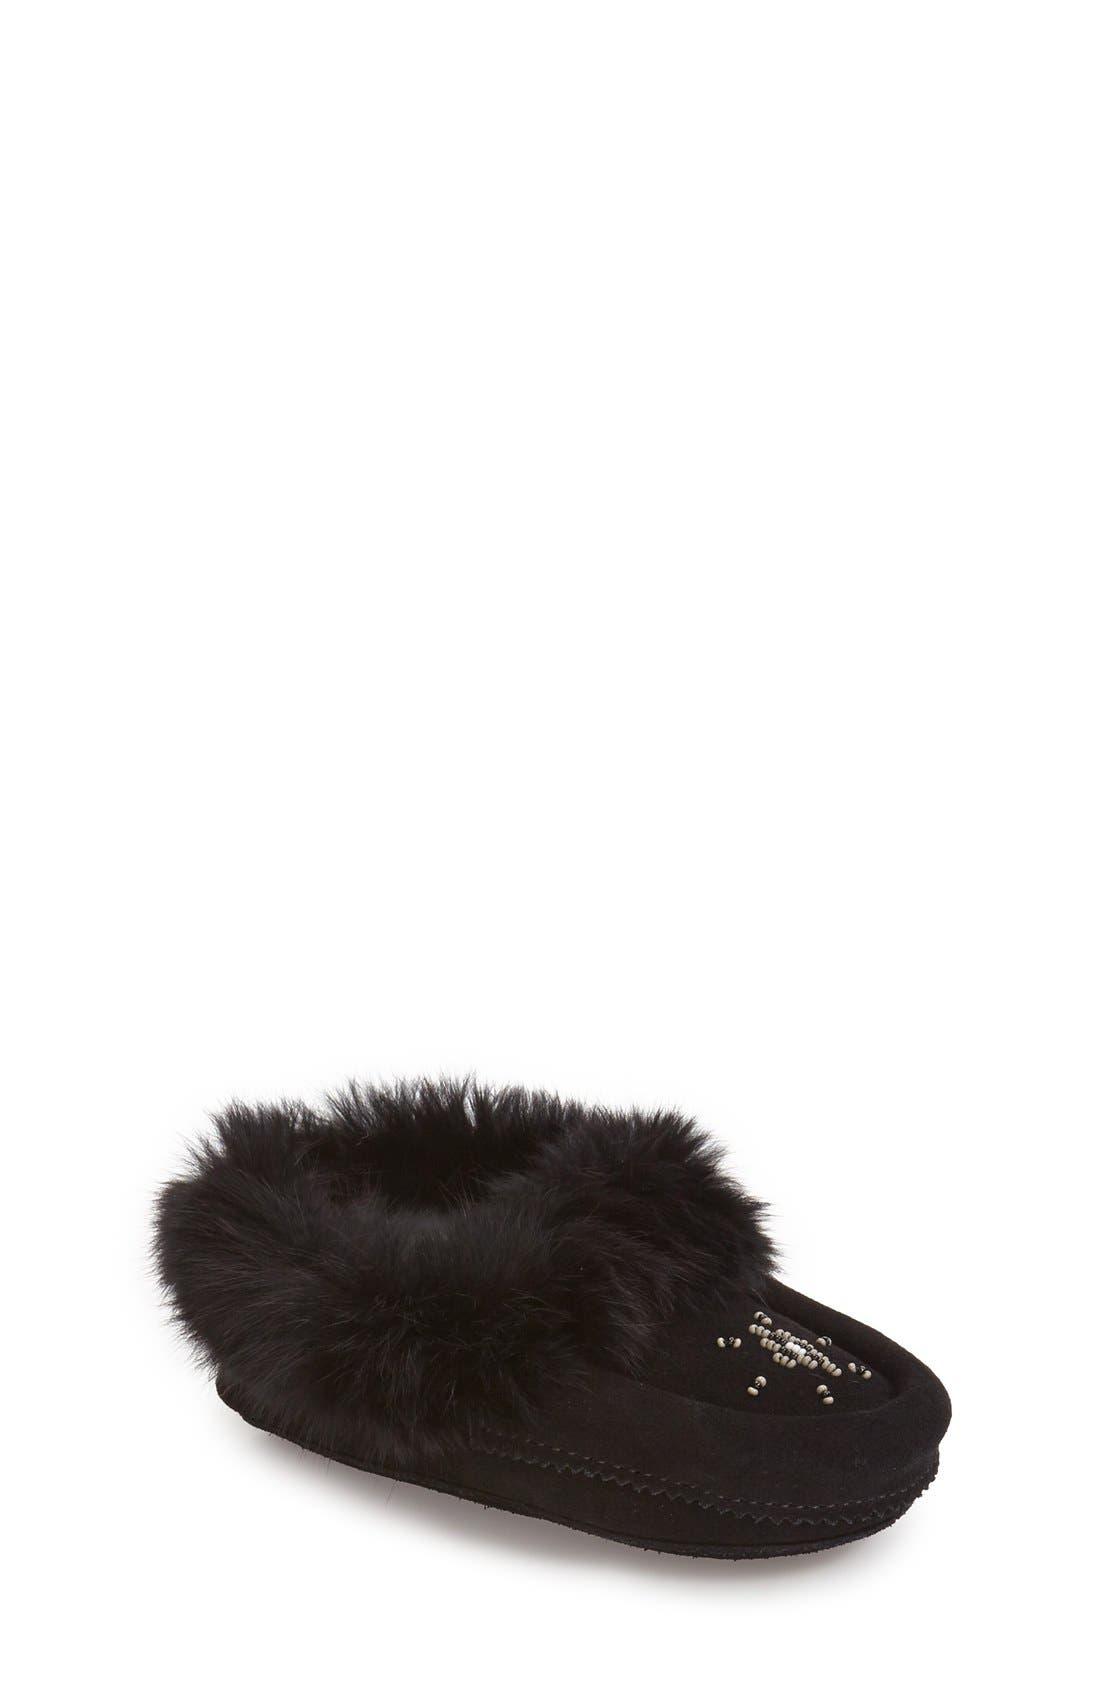 Genuine Rabbit Fur Moccasin,                         Main,                         color,